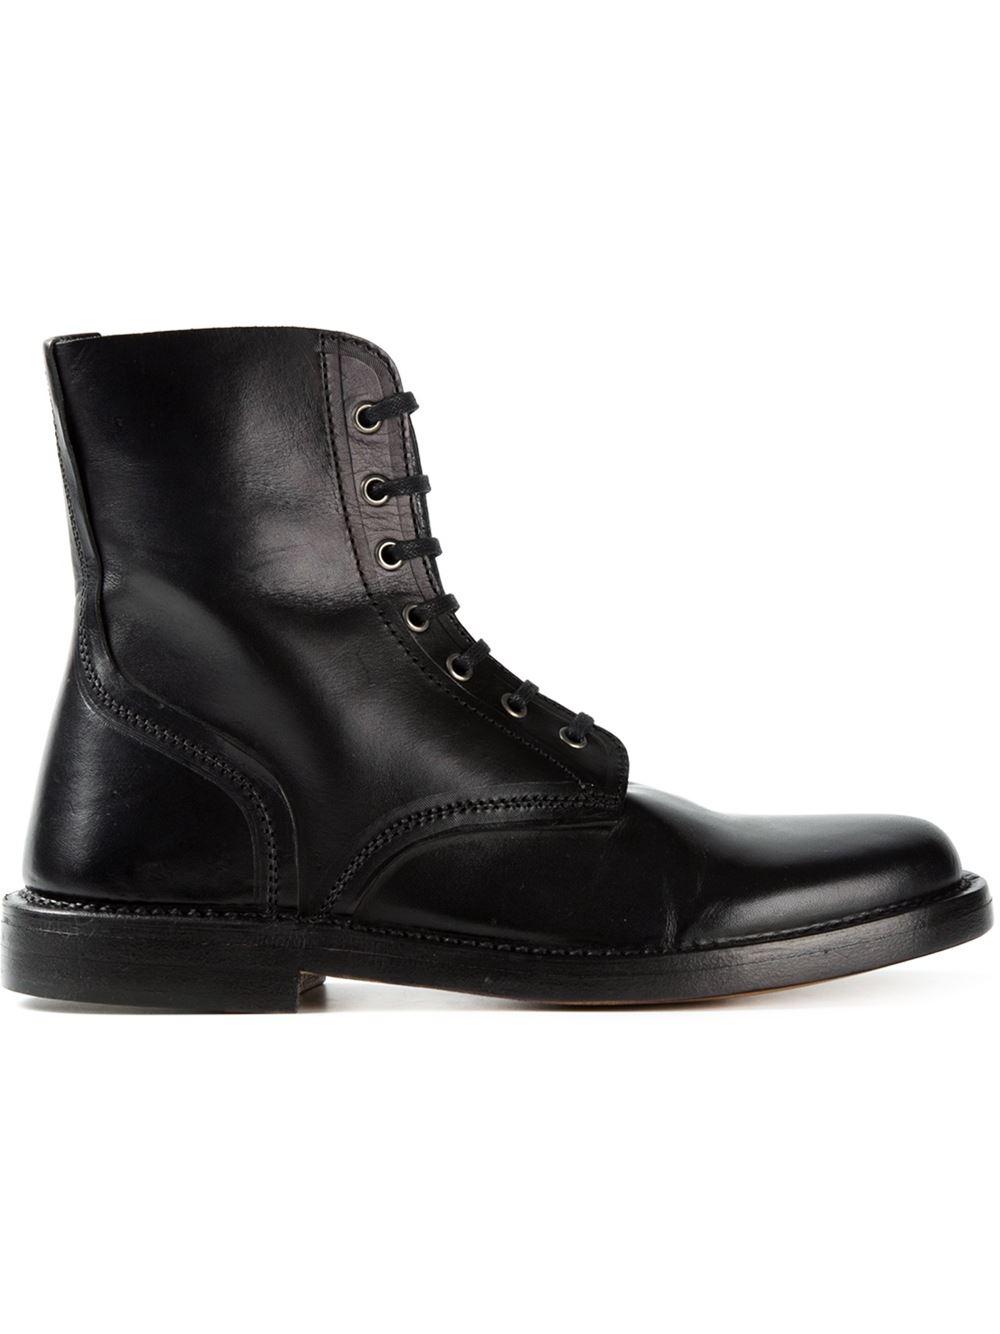 Alexander Mcqueen Lace Up Combat Boots In Black For Men Lyst